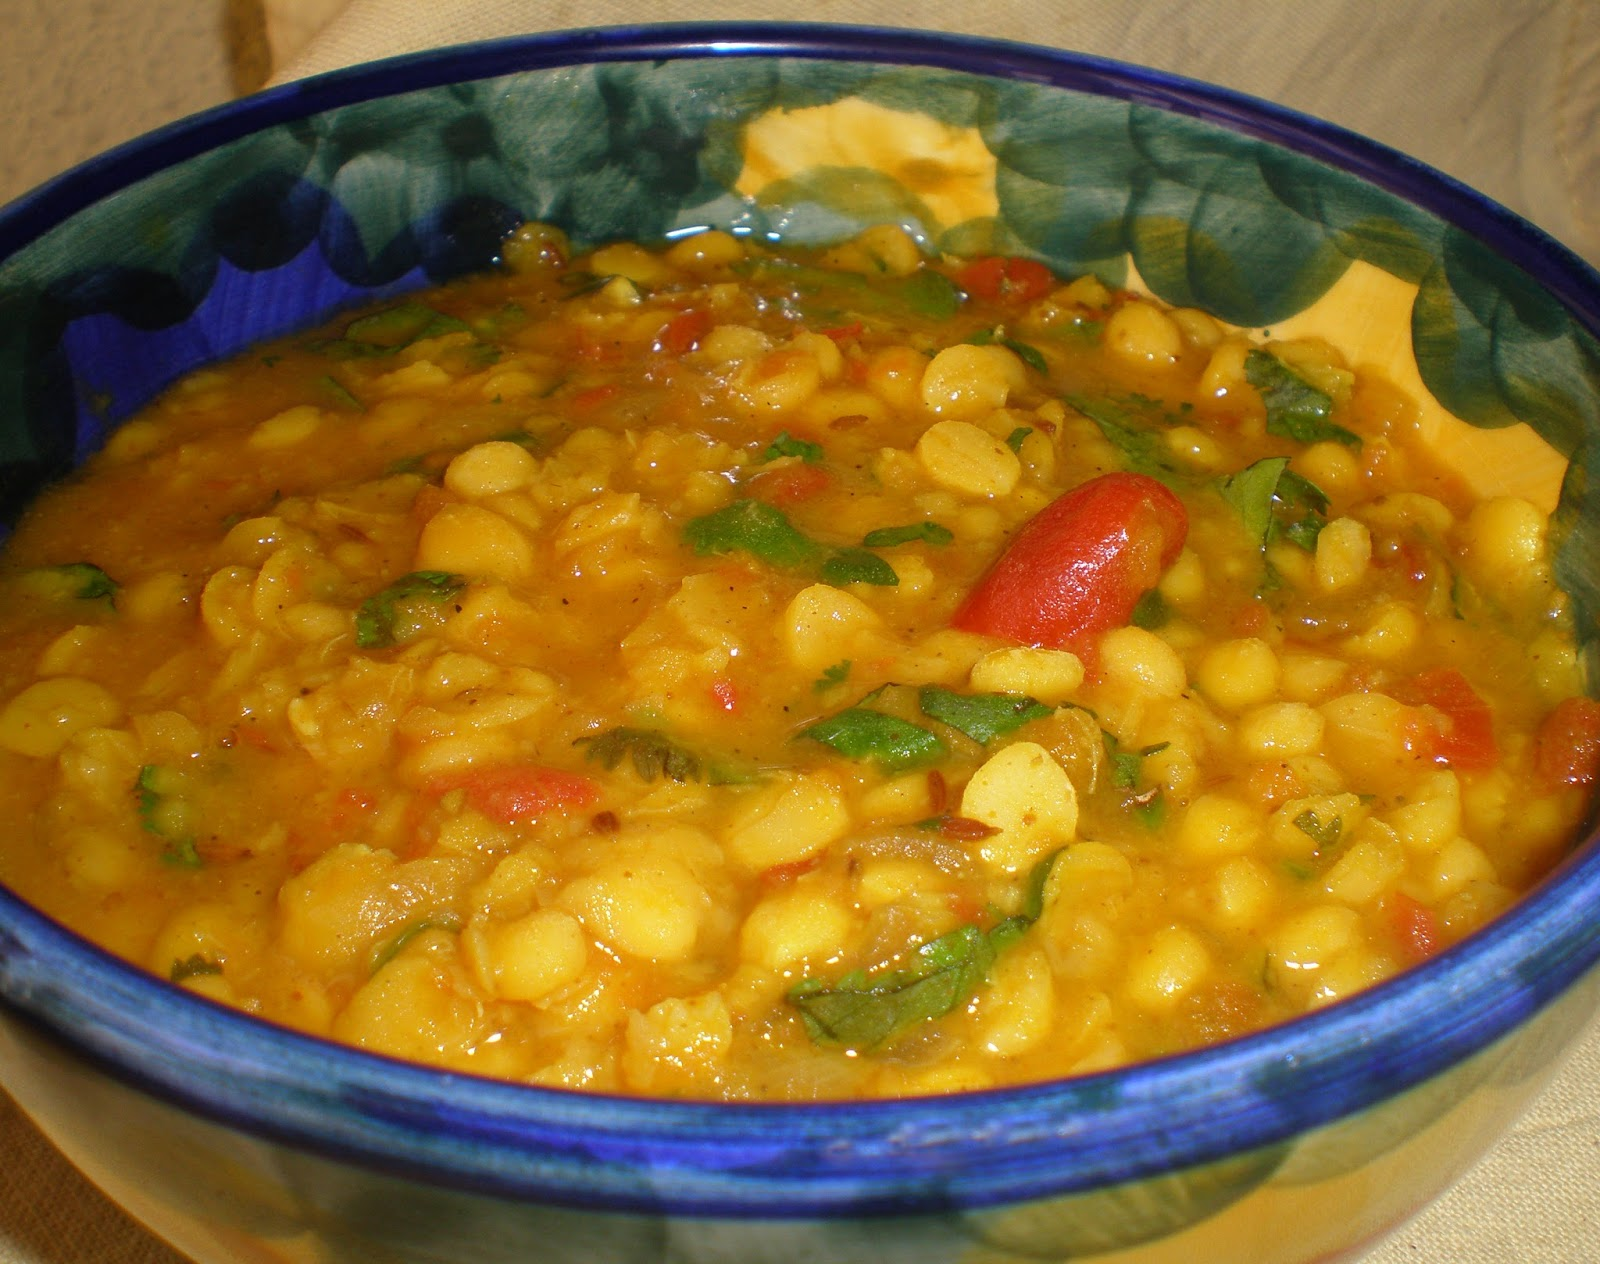 La cocinera novata tarka dal plato indio de legumbres tarka dal plato indio de legumbres fuente indian food made easy de anjum anand forumfinder Images